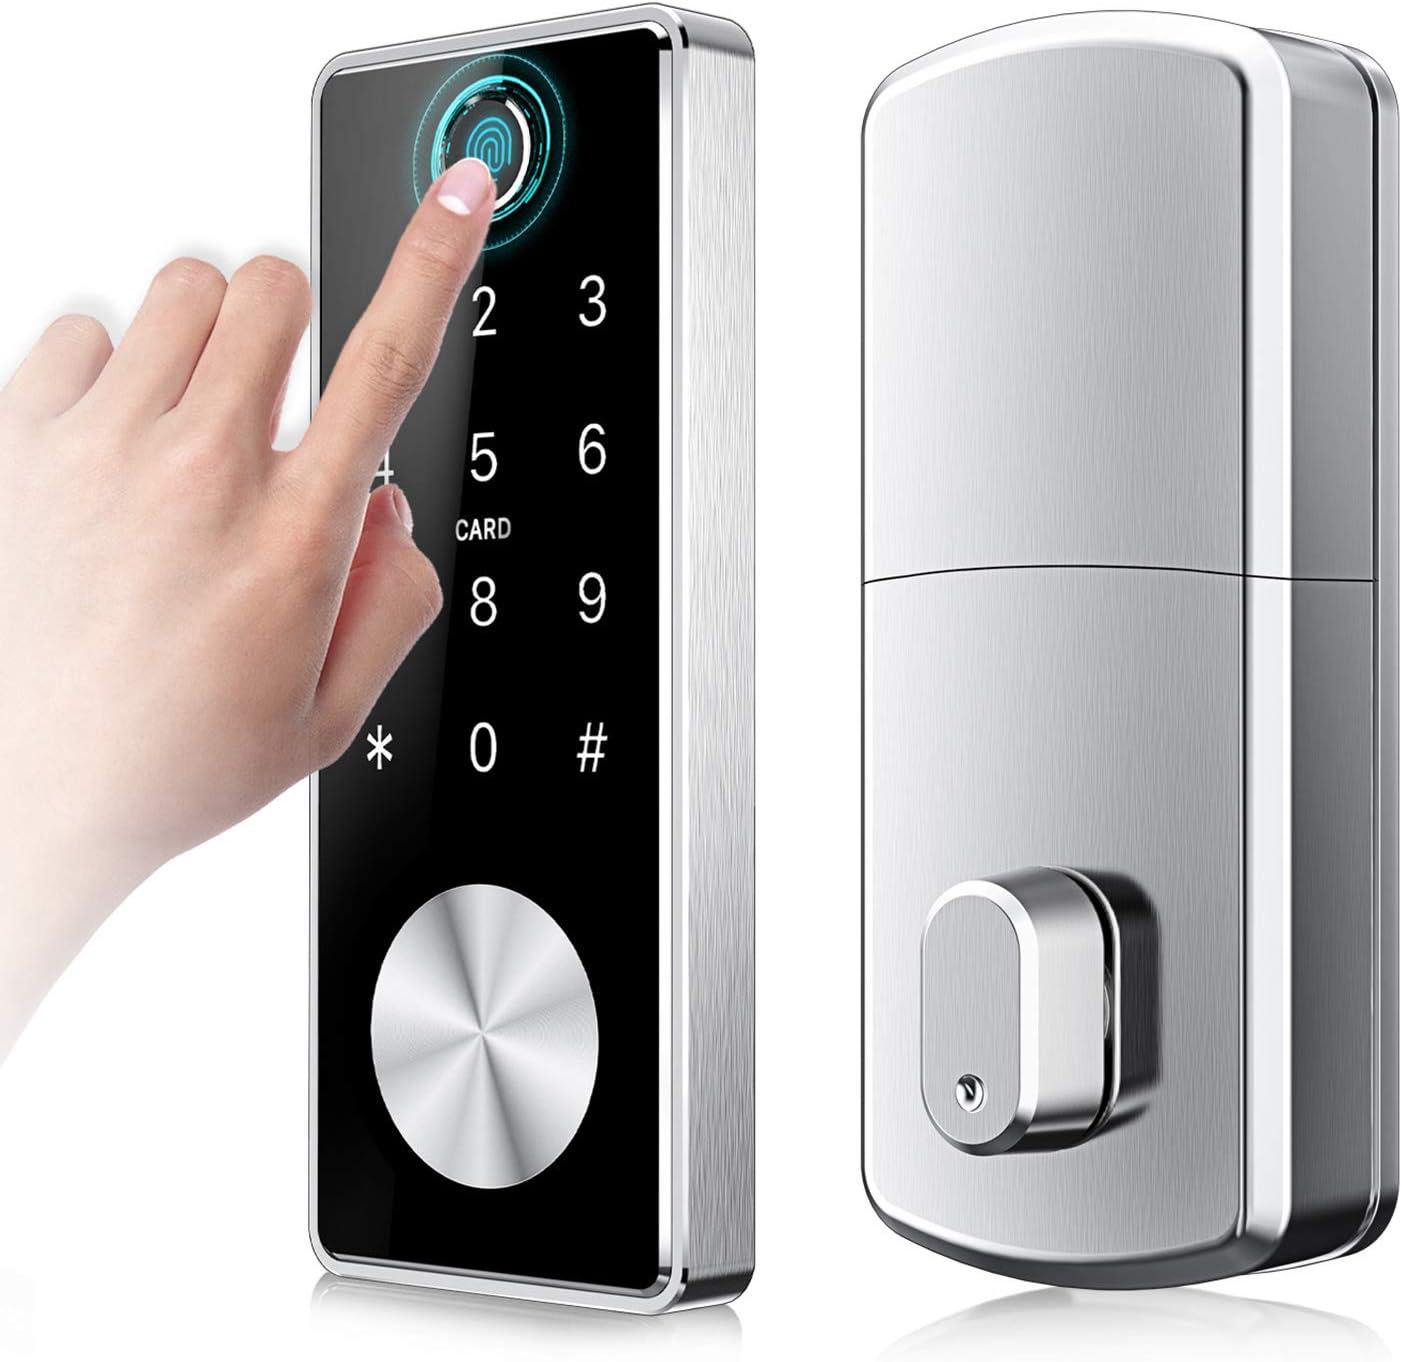 Keyless Entry Door Lock Smart Touchscreen Keypad Electronic Deadbolt Fingerprint Lock for Door Knob Bluetooth App Key ID Card Digital Code Auto Lock Front Door Locks for Home Office by Nyboer(Silver)